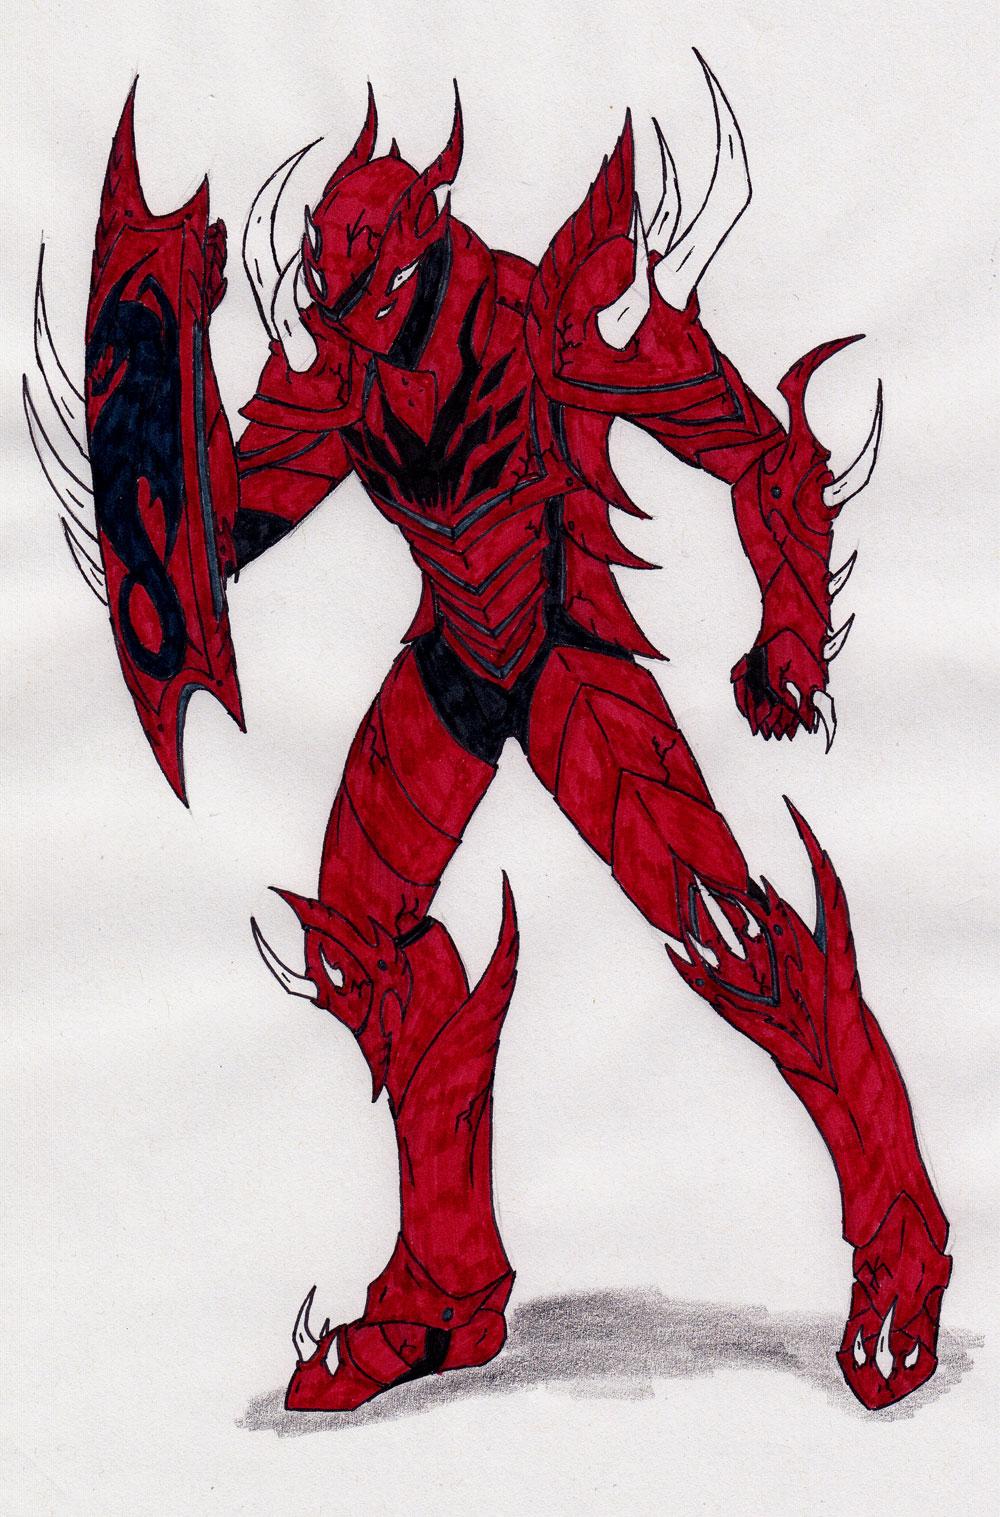 Spiked Dragon Armor Permutation By Nimrohd On Deviantart Мистическая броня и дракон от zerofrost / zerofrost mythical armors and dragon. spiked dragon armor permutation by